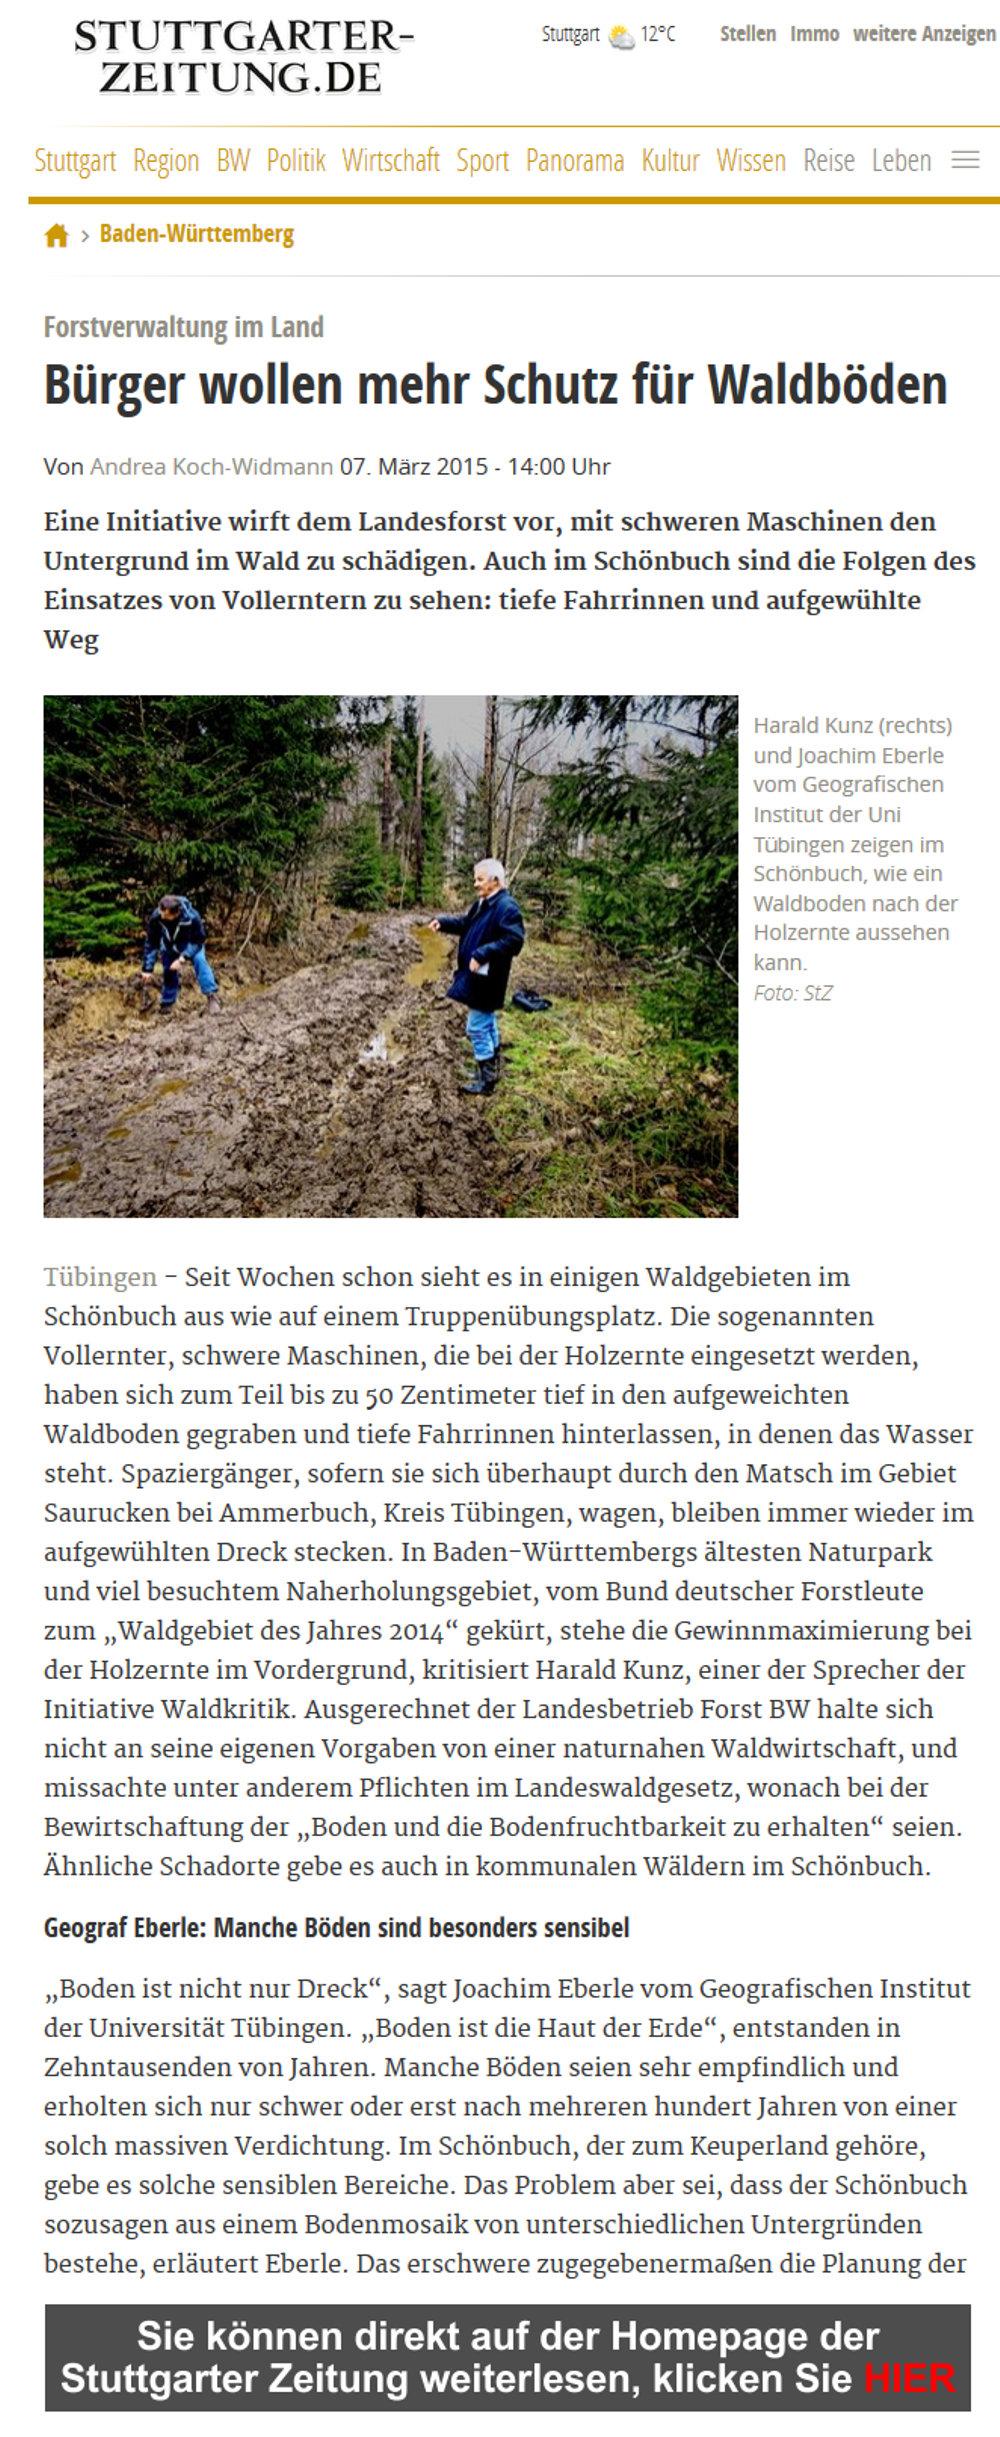 Artikel_7_3_2015_Stuttgarter_Zeitung